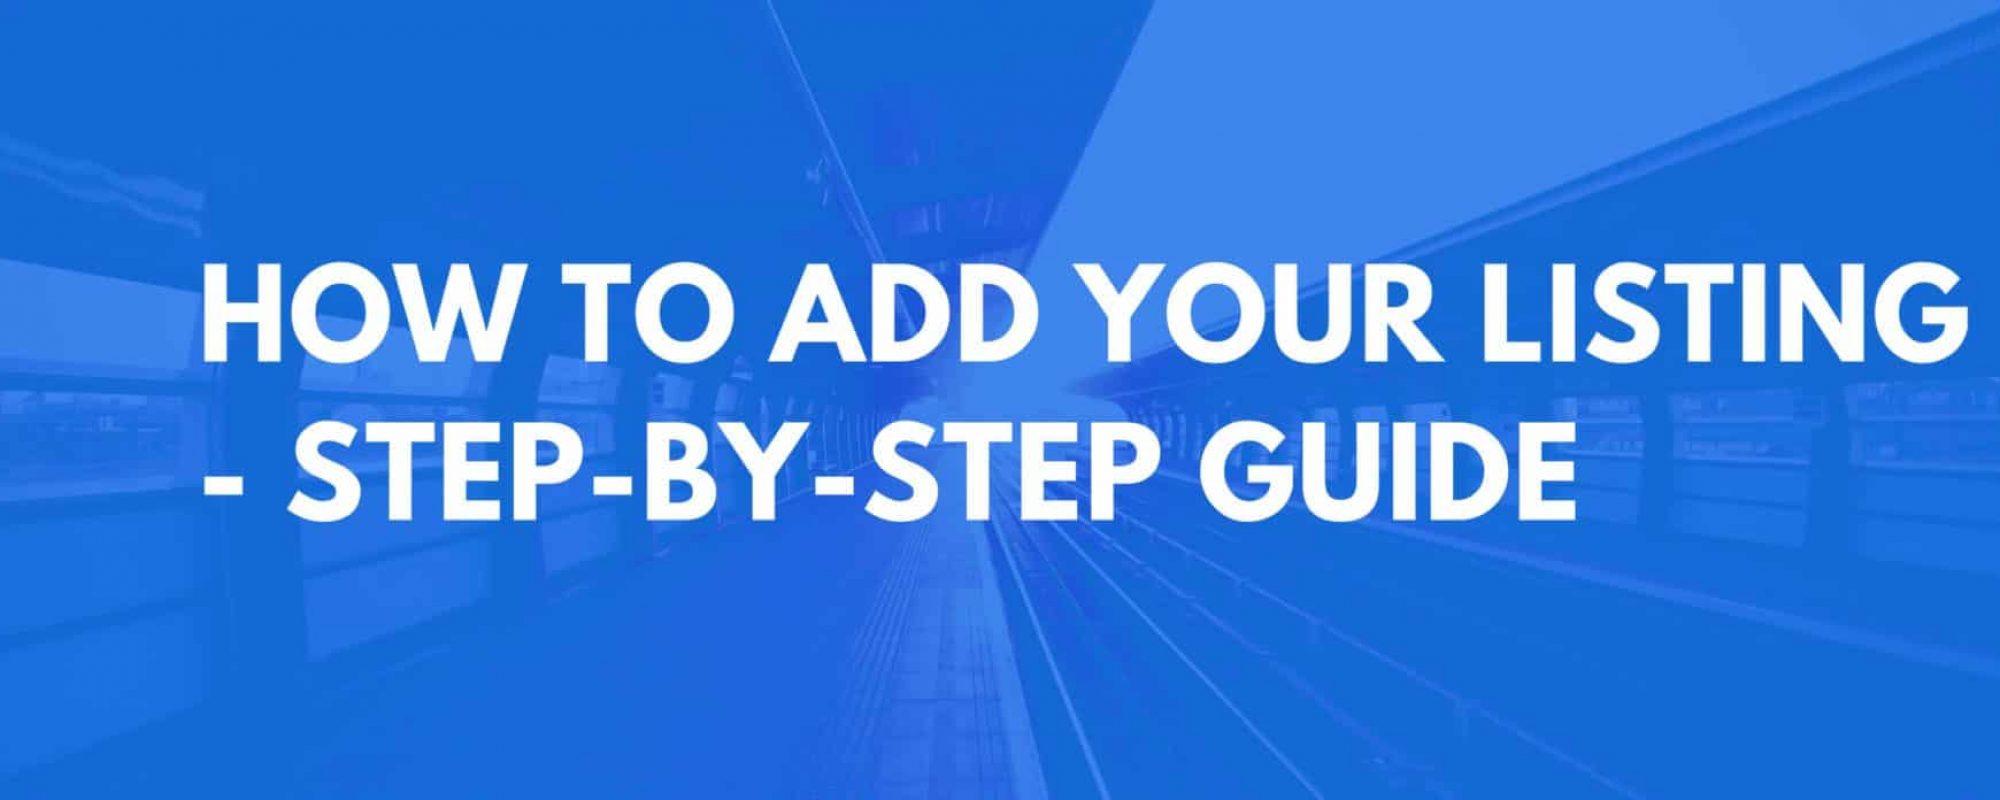 add listing guide